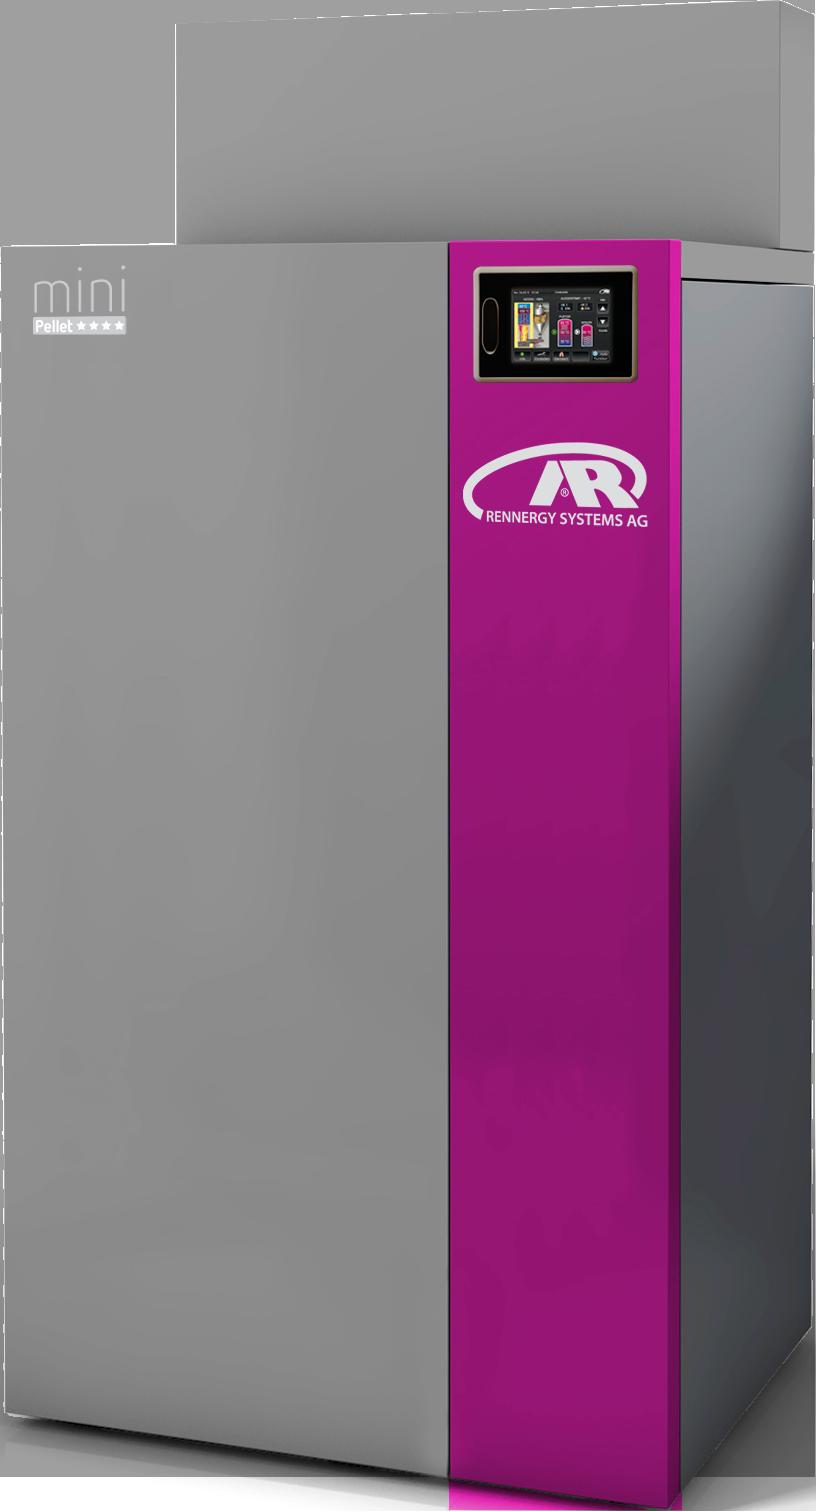 Rennergy Pellet Mini RPM6-15